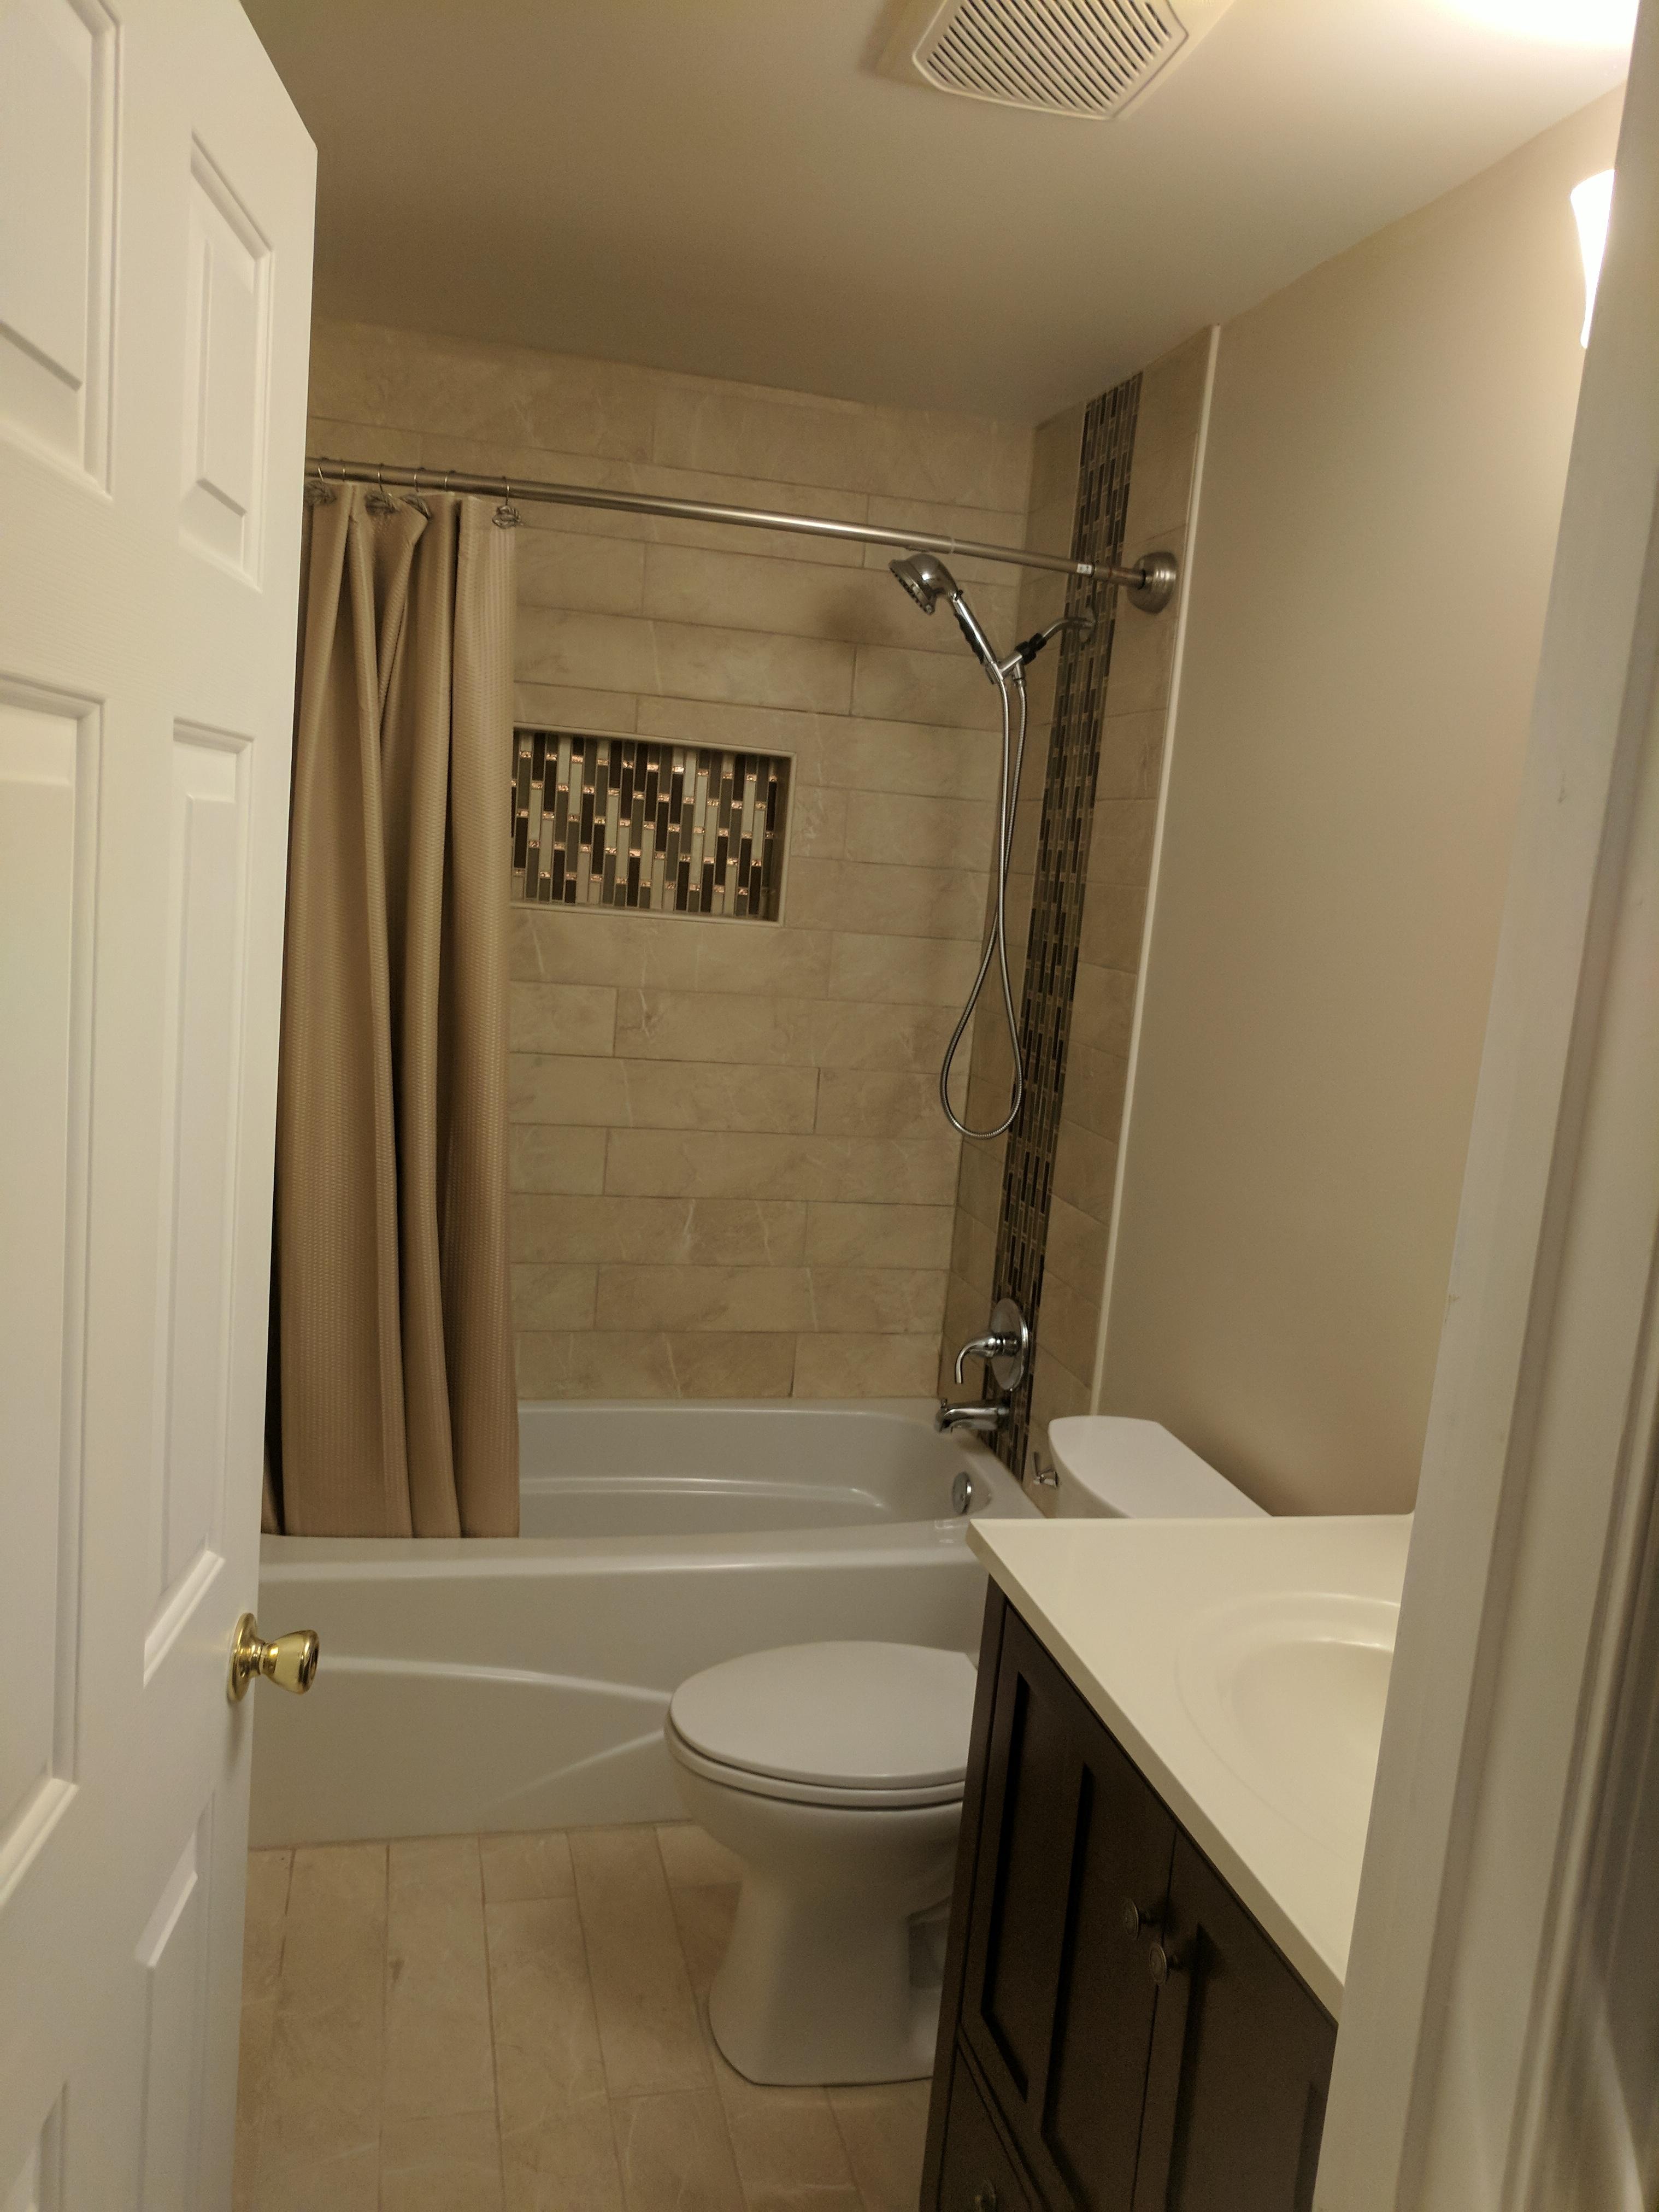 Bathroom Remodel The Builder LLC